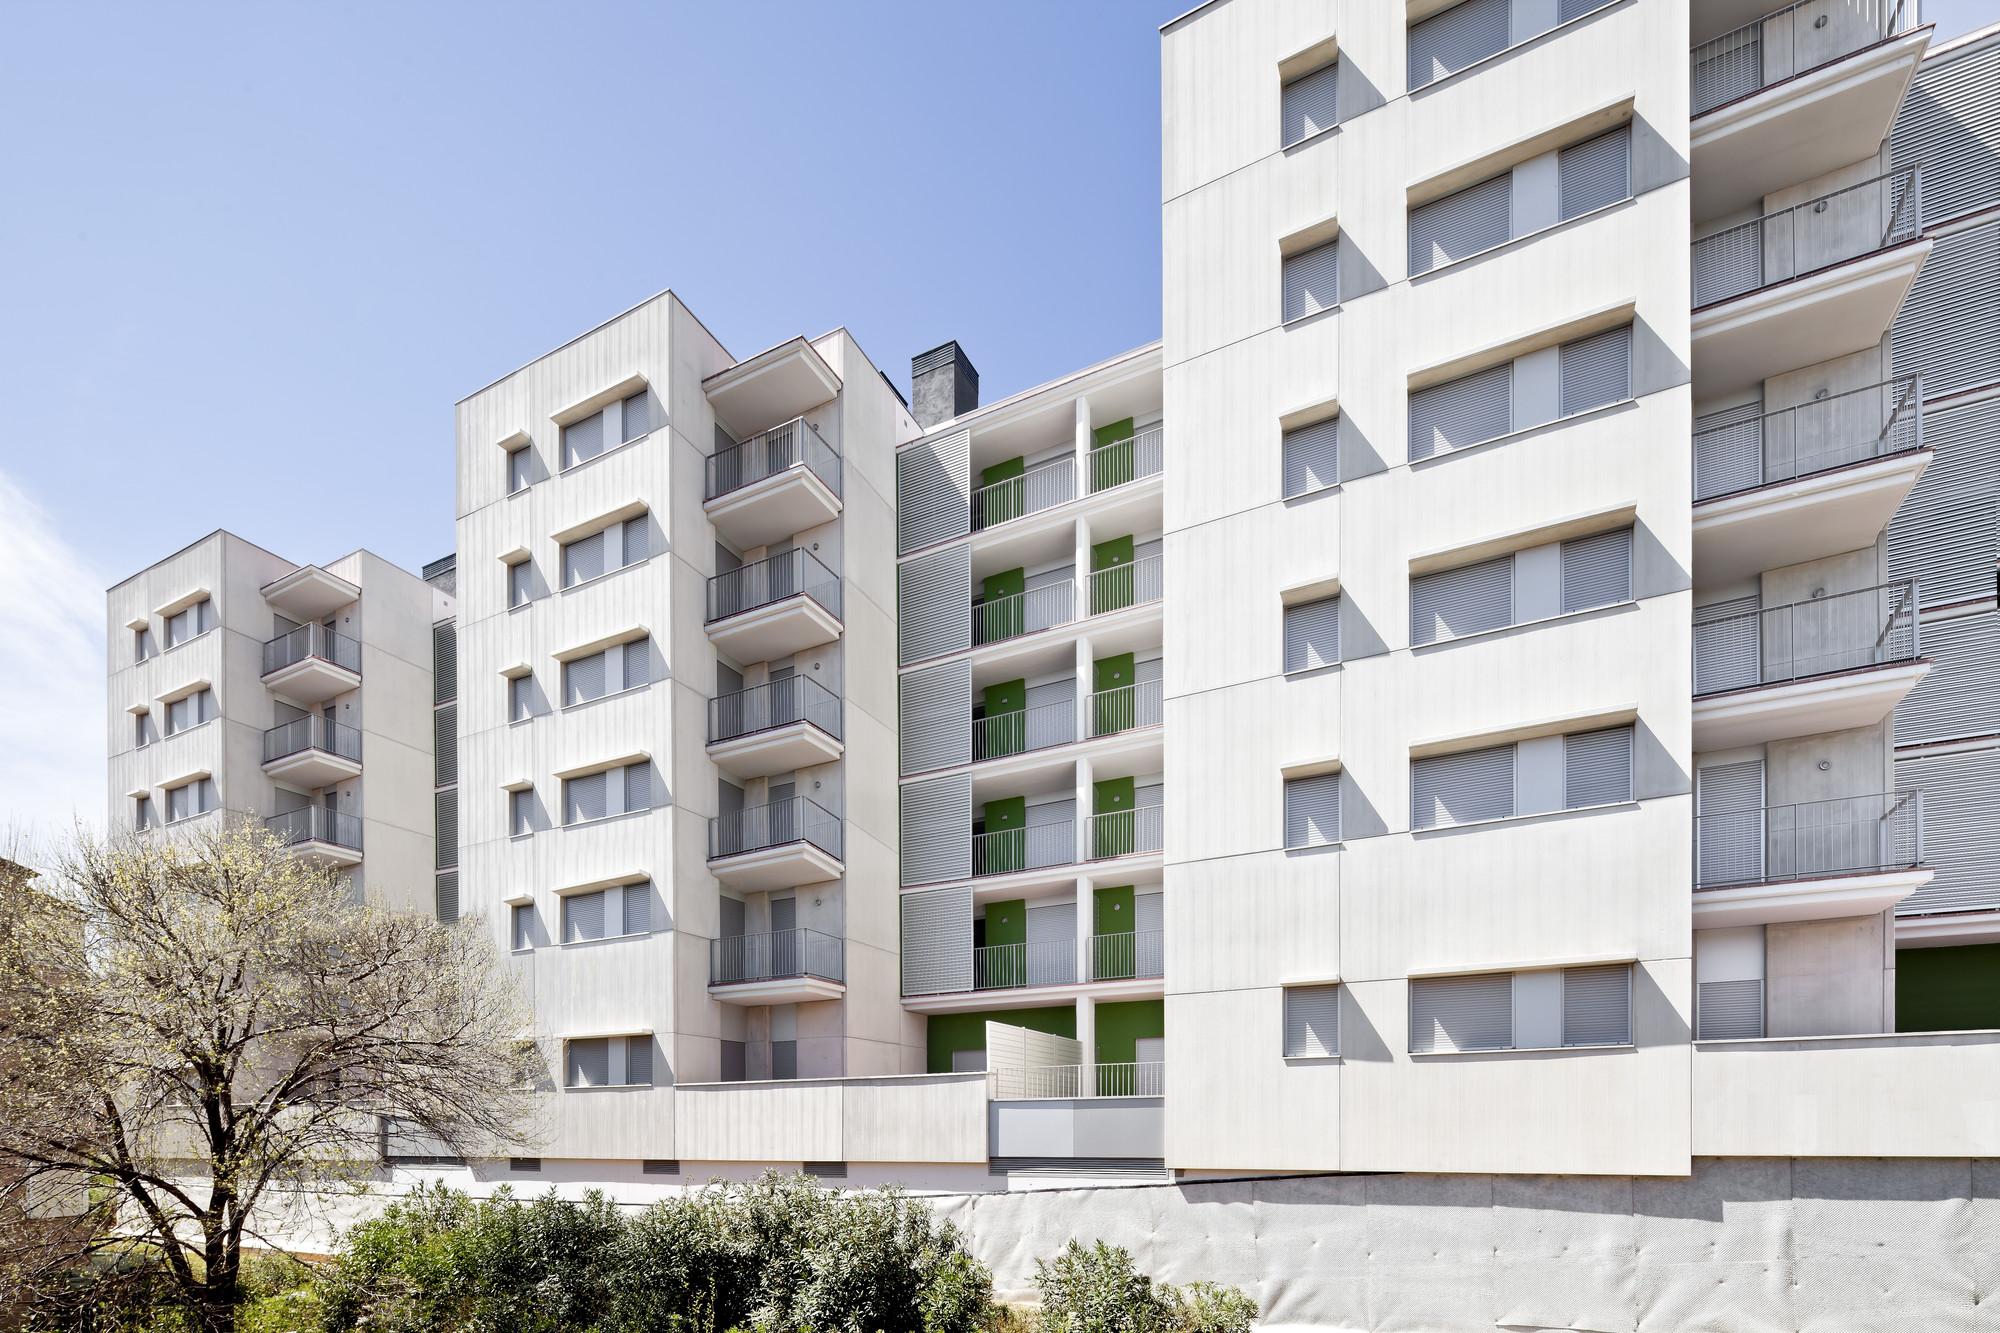 Viviendas en Trinitat / Ravetllat Ribas Arquitectos